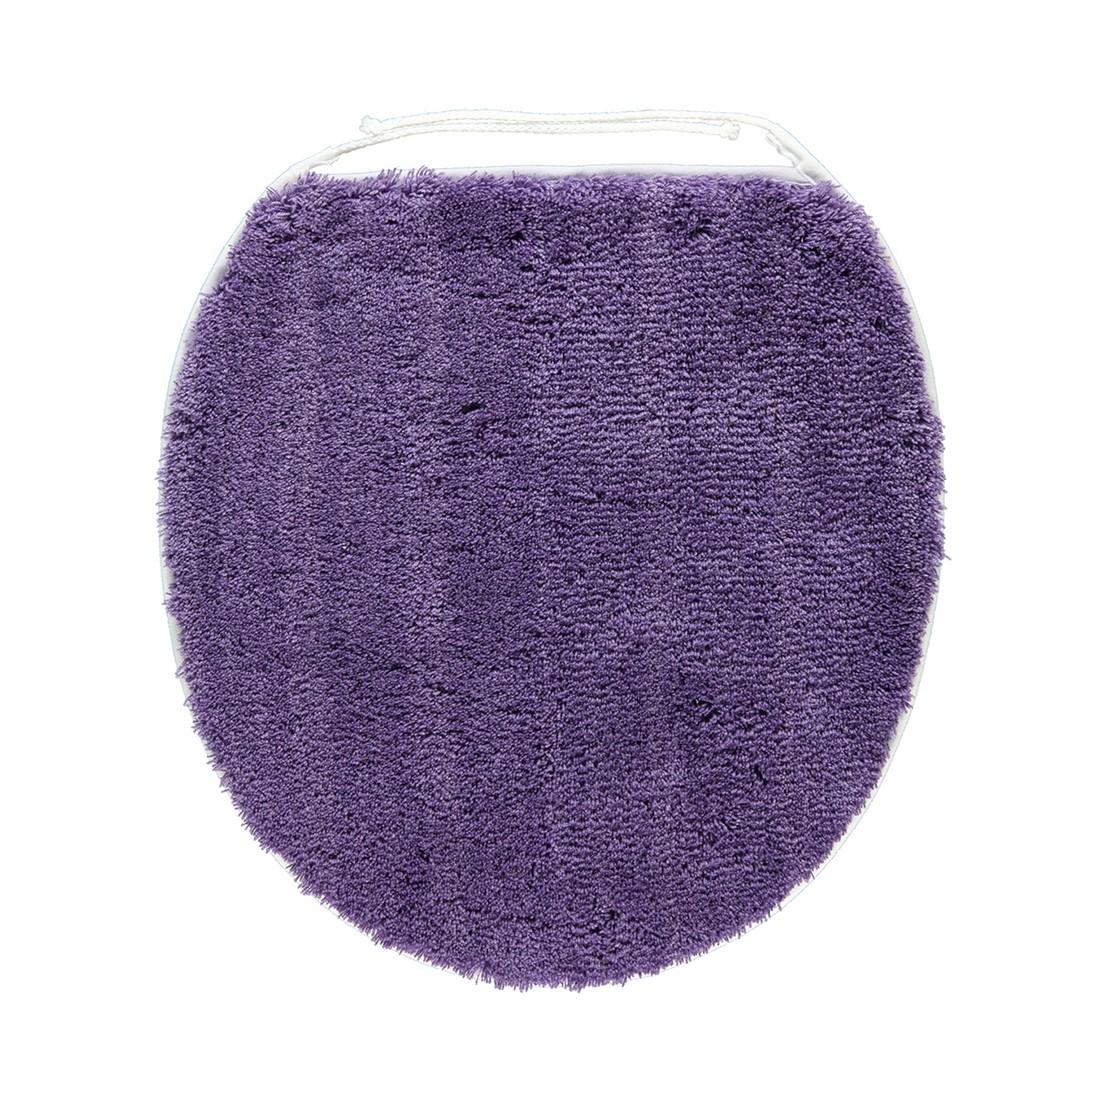 Deckelbezug Soft – 100% Polyacryl Holunder – 812, Kleine Wolke günstig